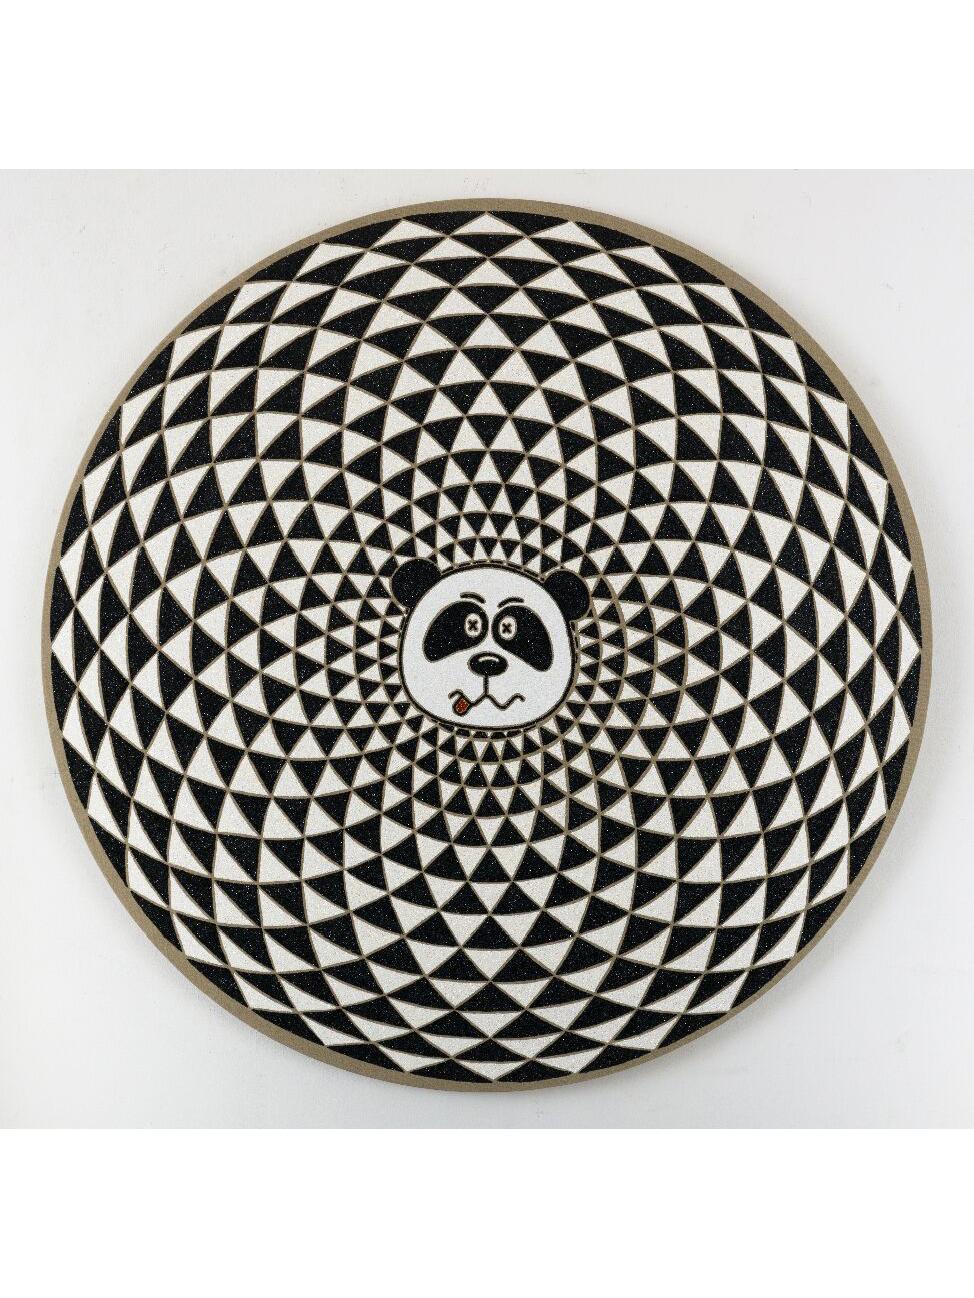 Hypnotic Panda #1